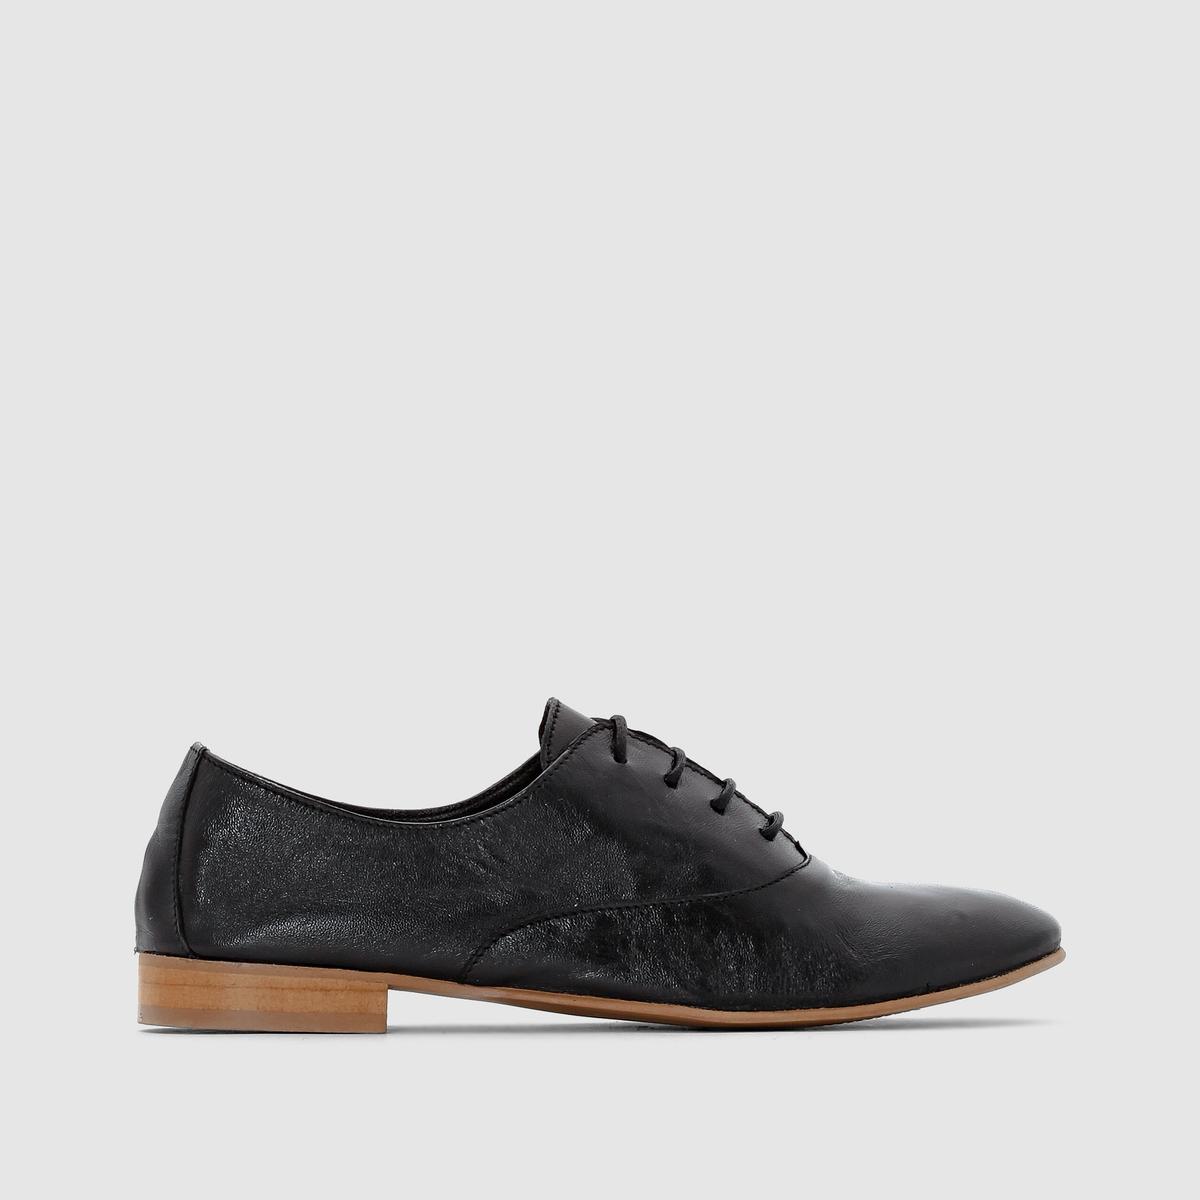 Ботинки-дерби из мягкой кожи от R studio